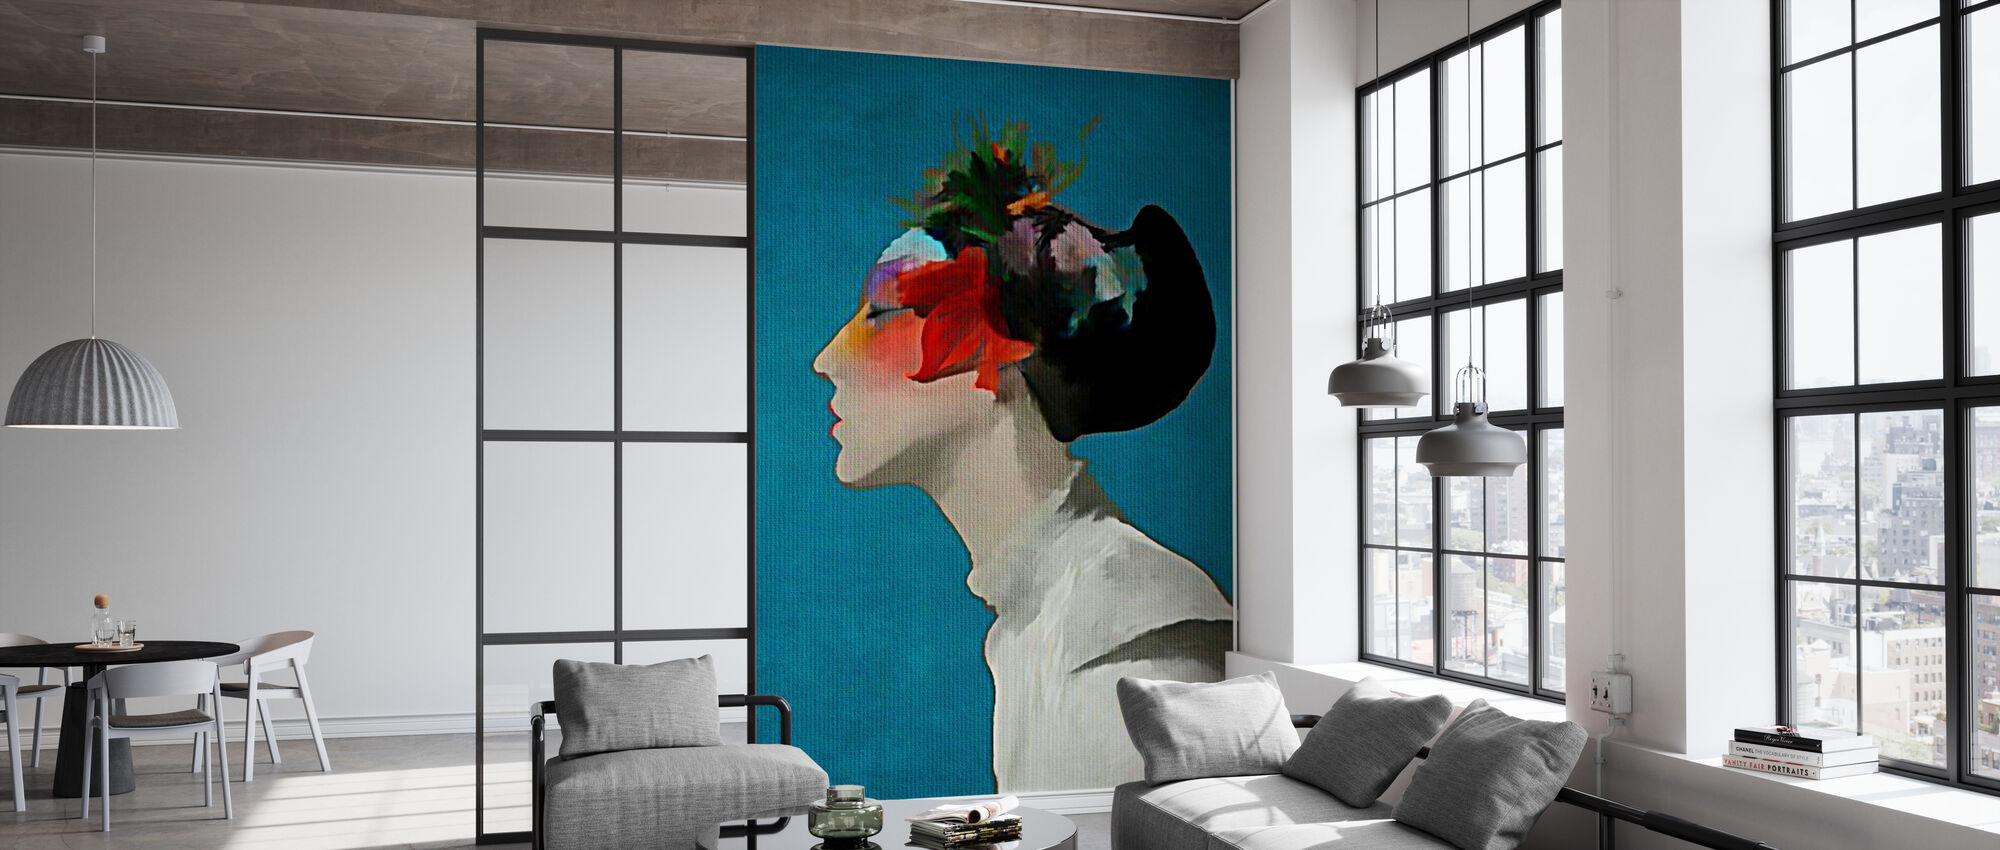 Kimono - Wallpaper - Office